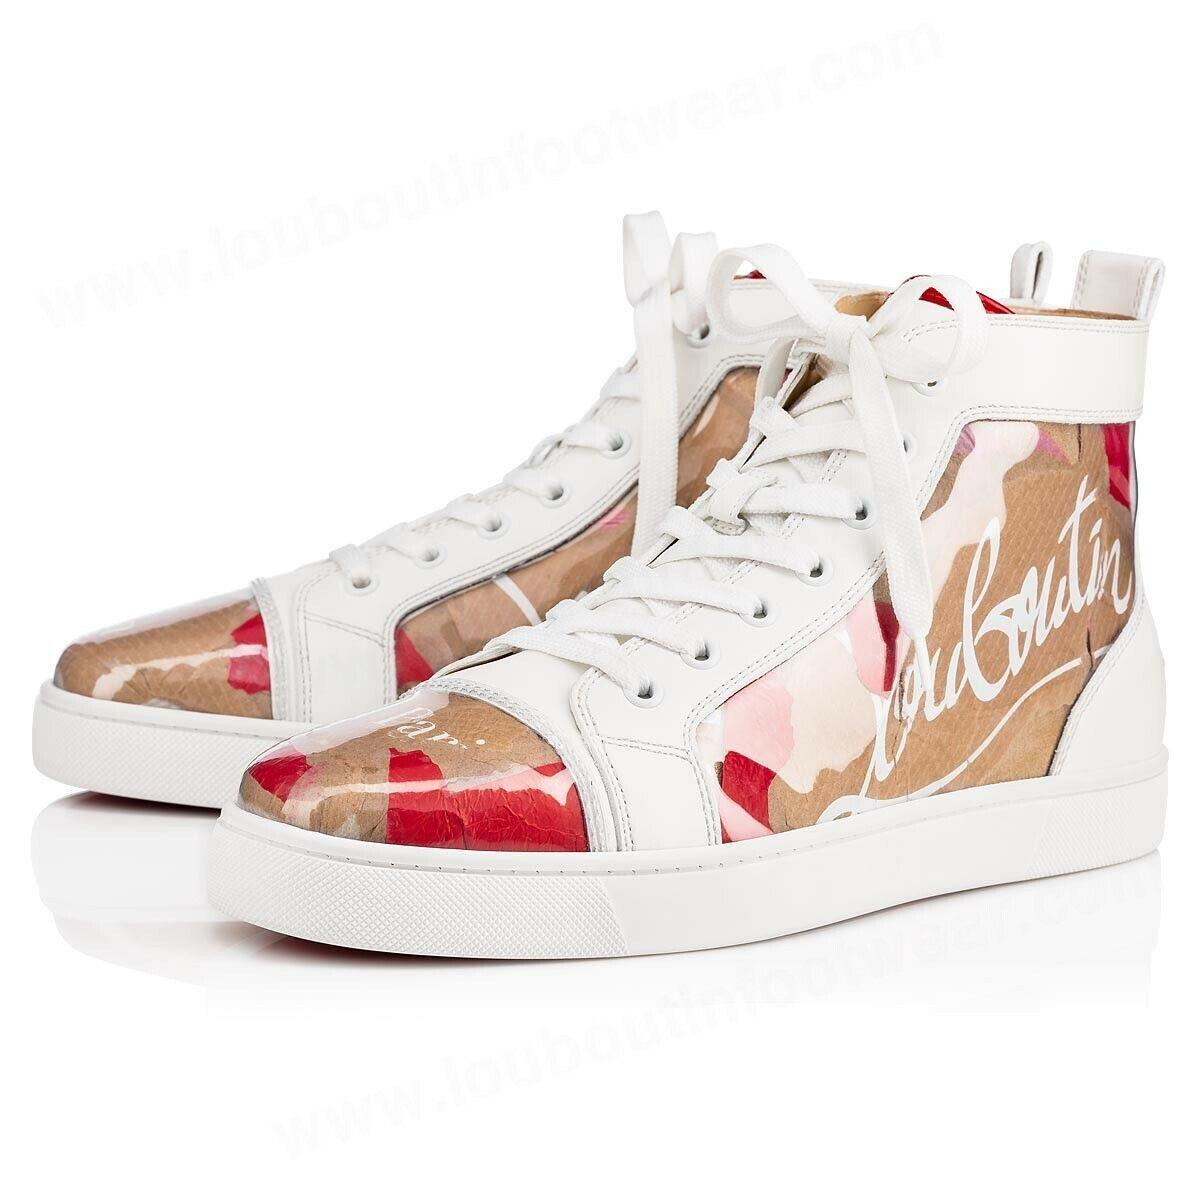 Christian Louboutin Mens Louis Flat Loubi Kraft PVC Nude Red High Top Sneaker 46